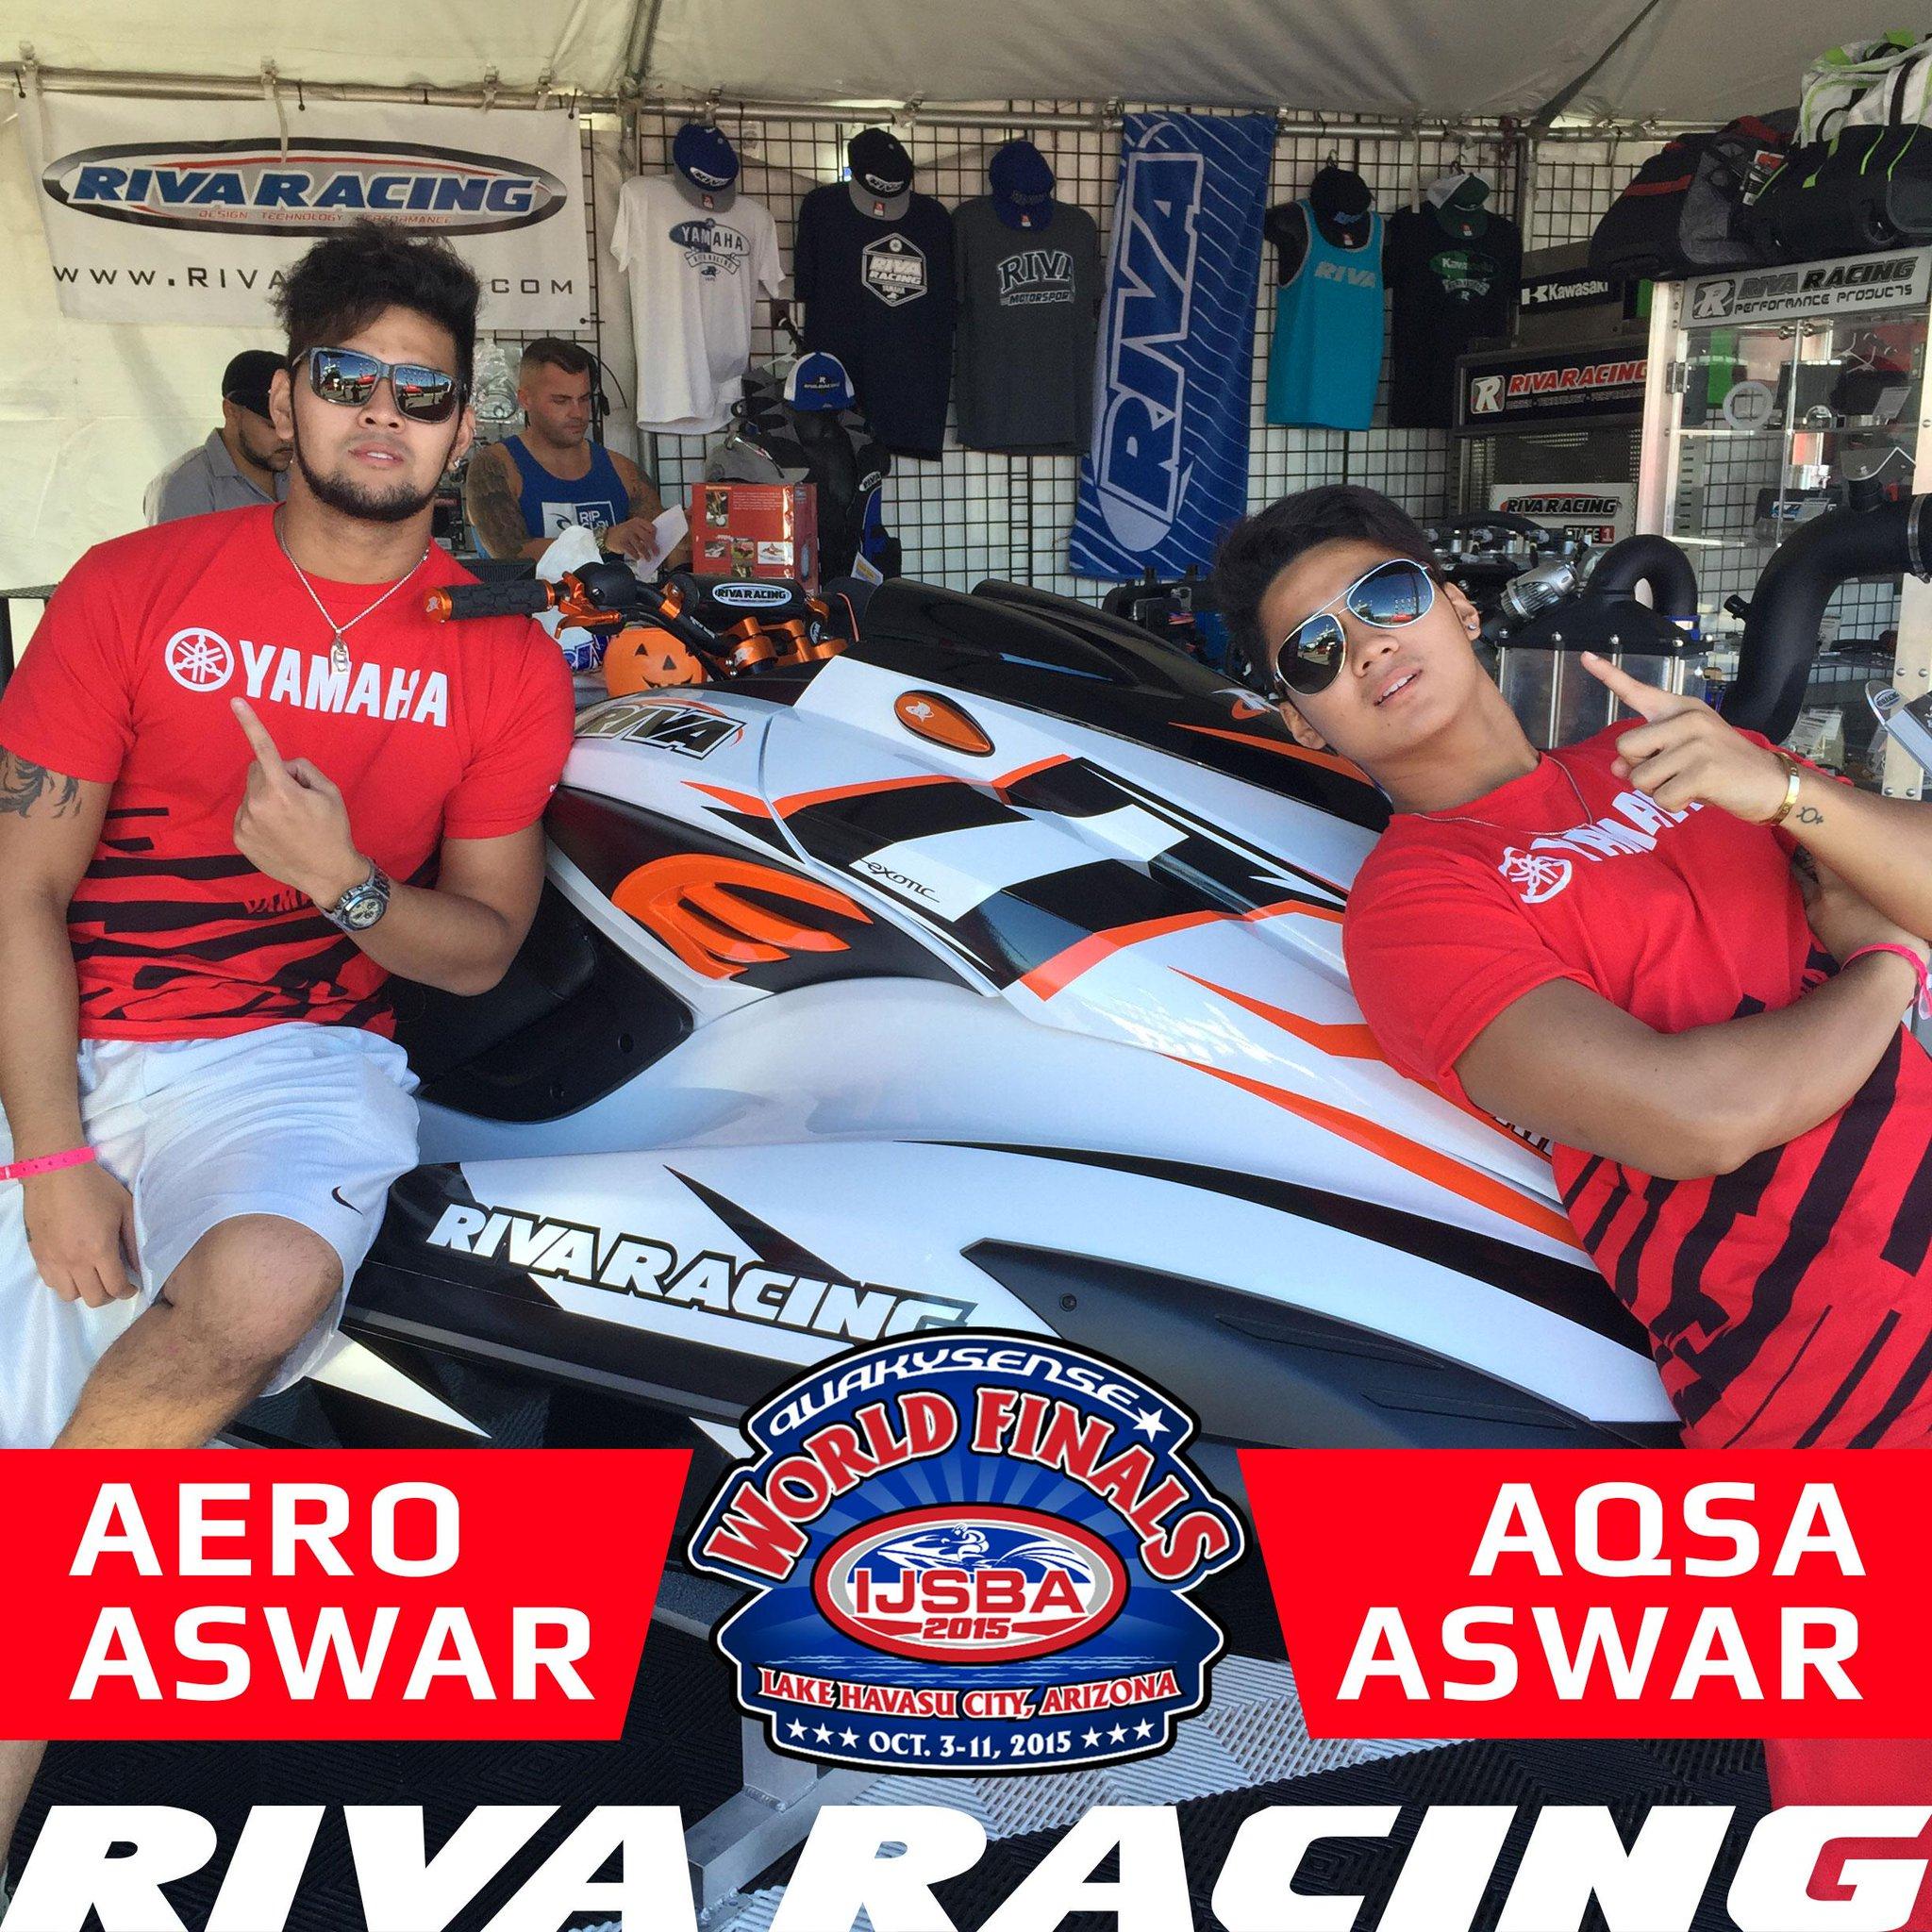 "RIVA RACING on Twitter ""Aero Aswar and Aqsa Aswar loving our new"